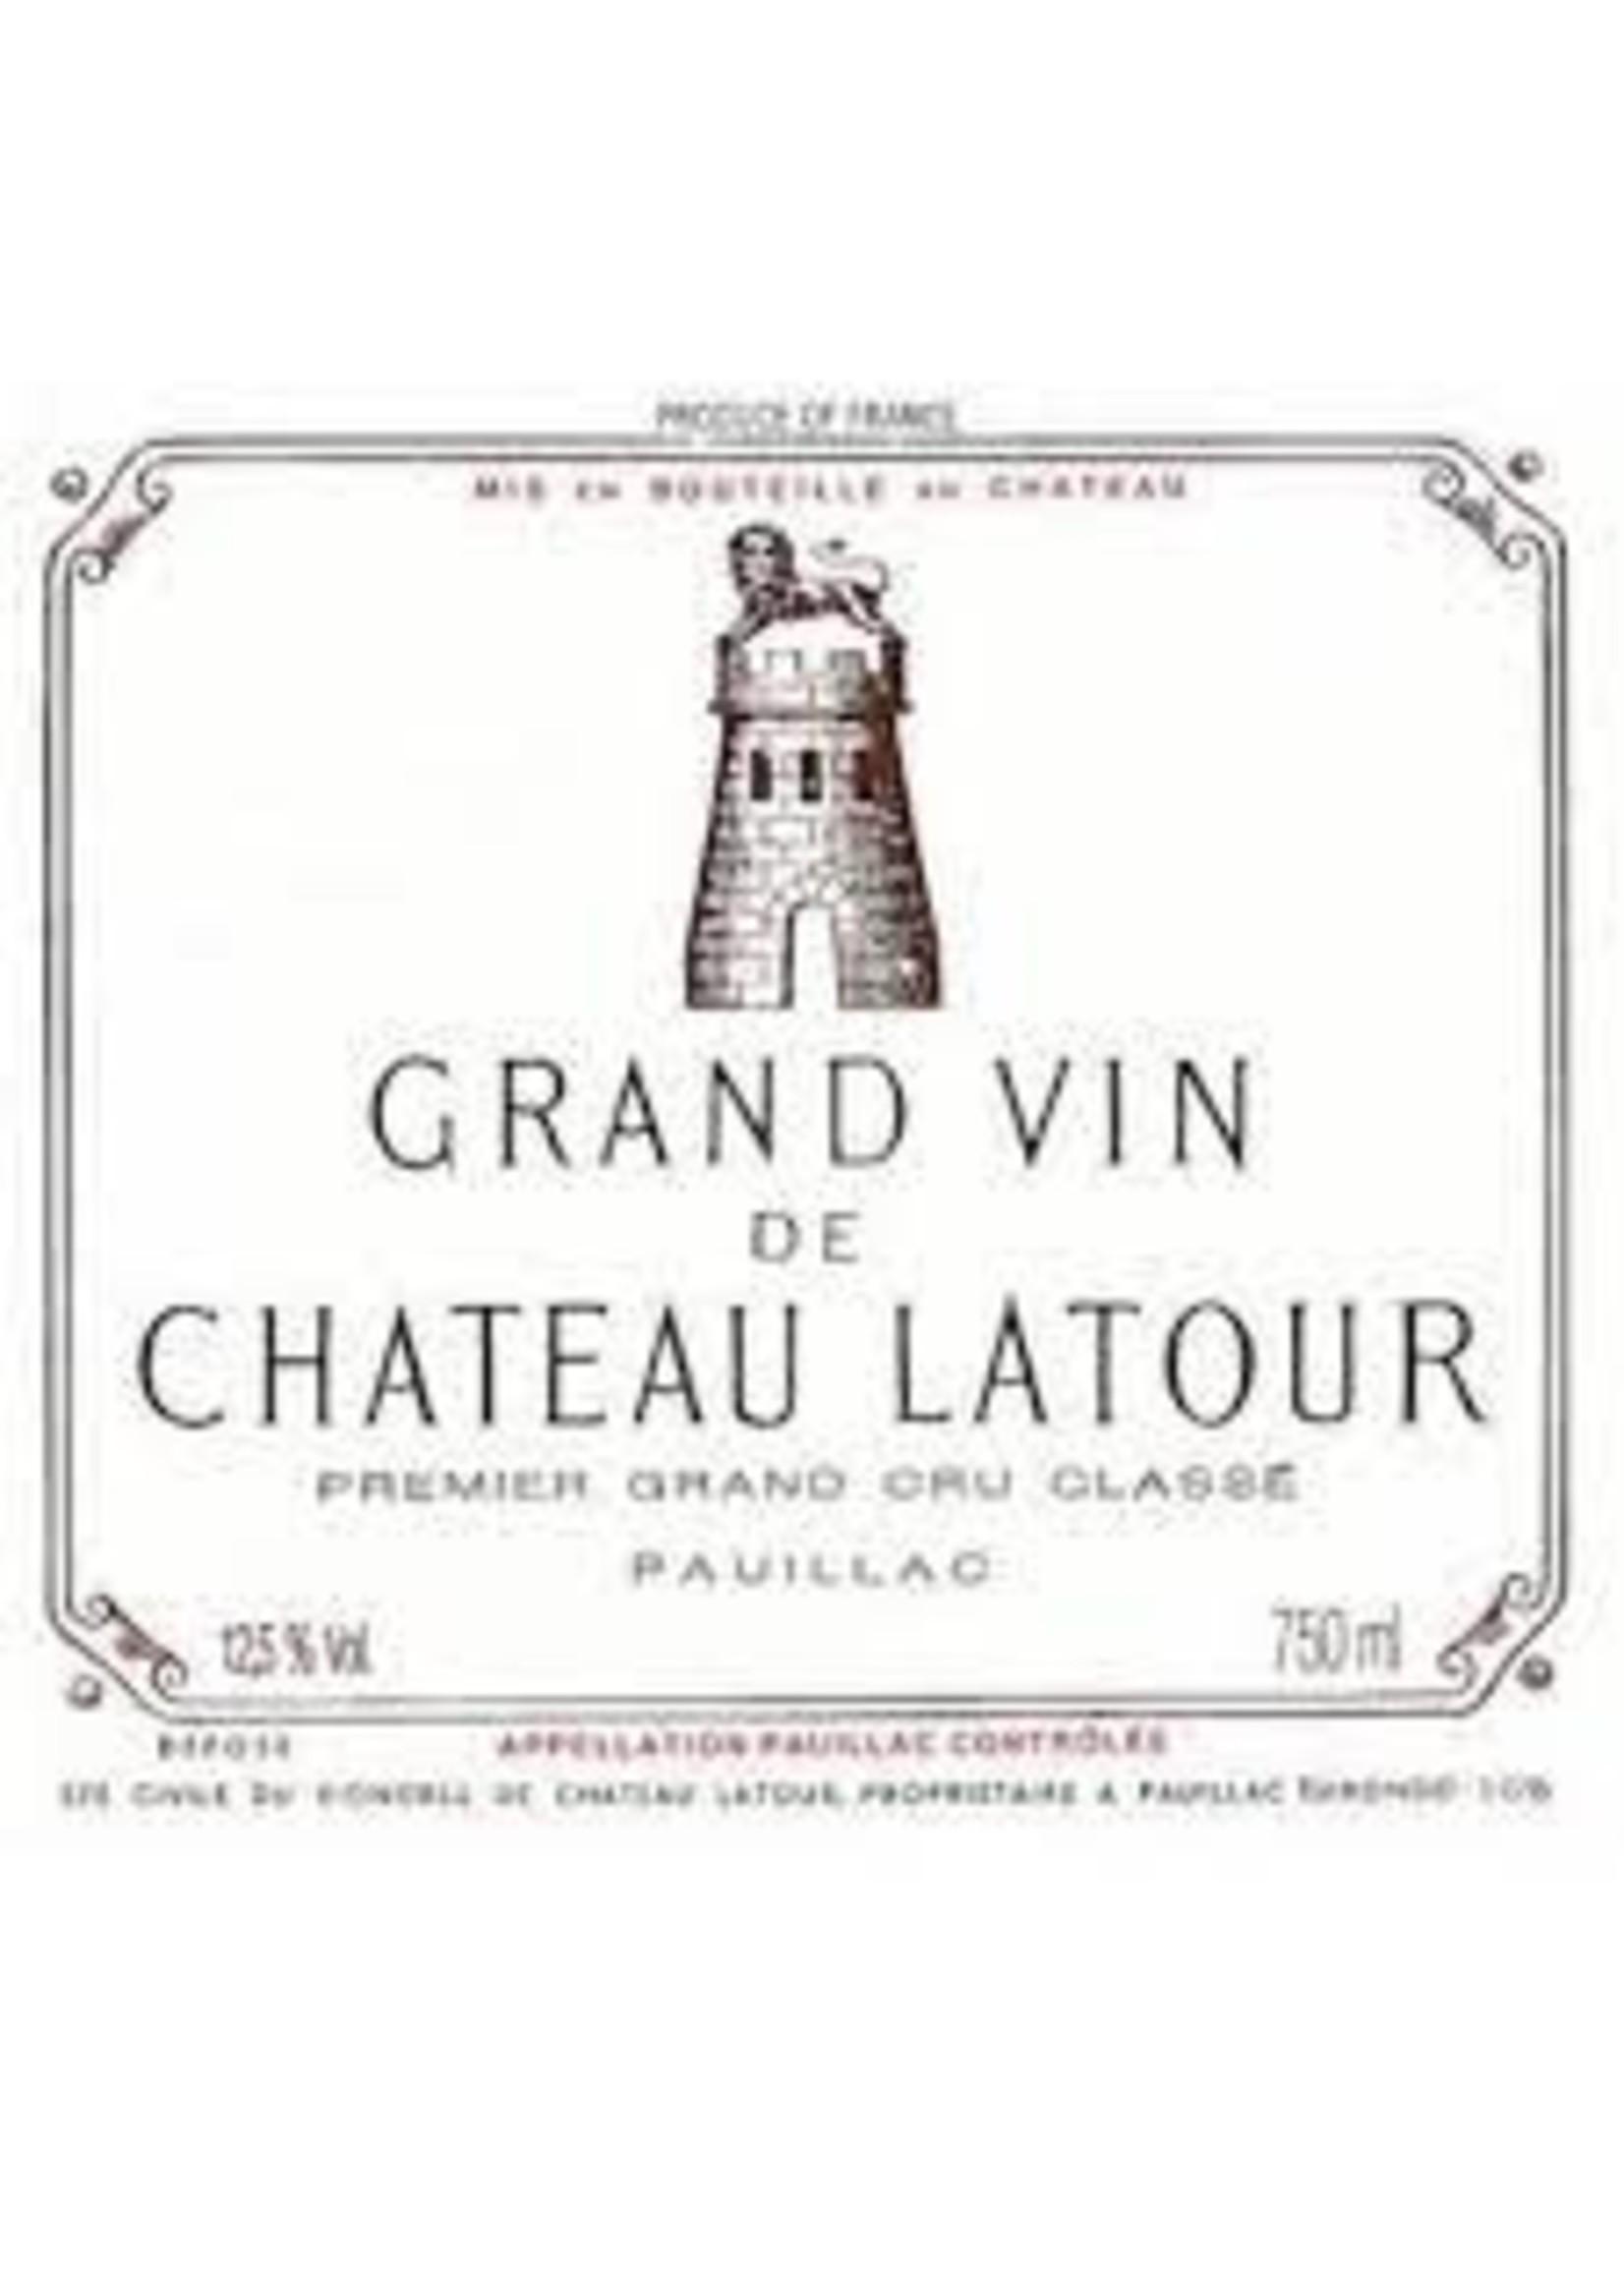 Chateau Latour 2009 Pauillac 750ml [PRE-ARRIVAL]